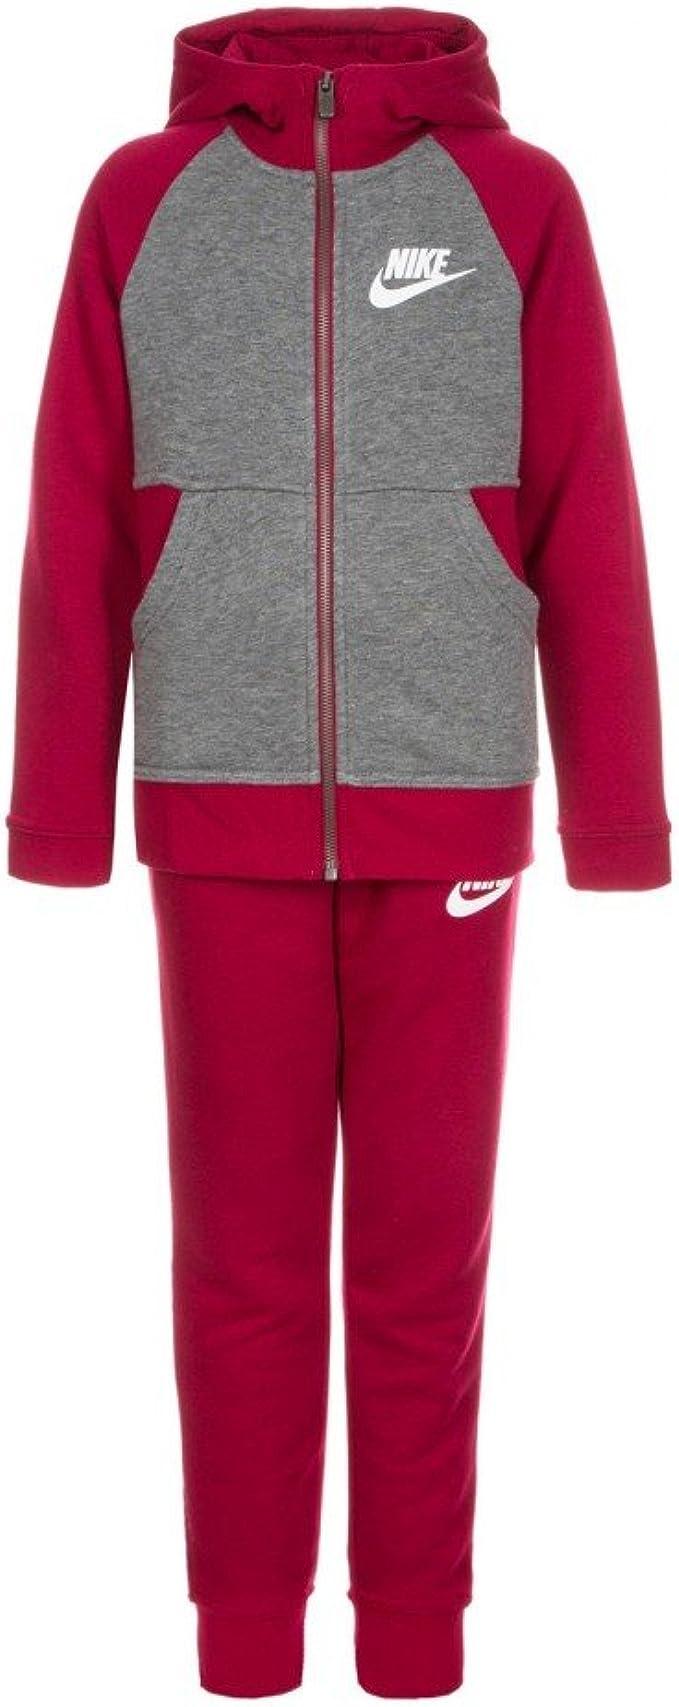 Nike G NSW TRK Suit FT - Chándal para niña: Amazon.es: Ropa y ...